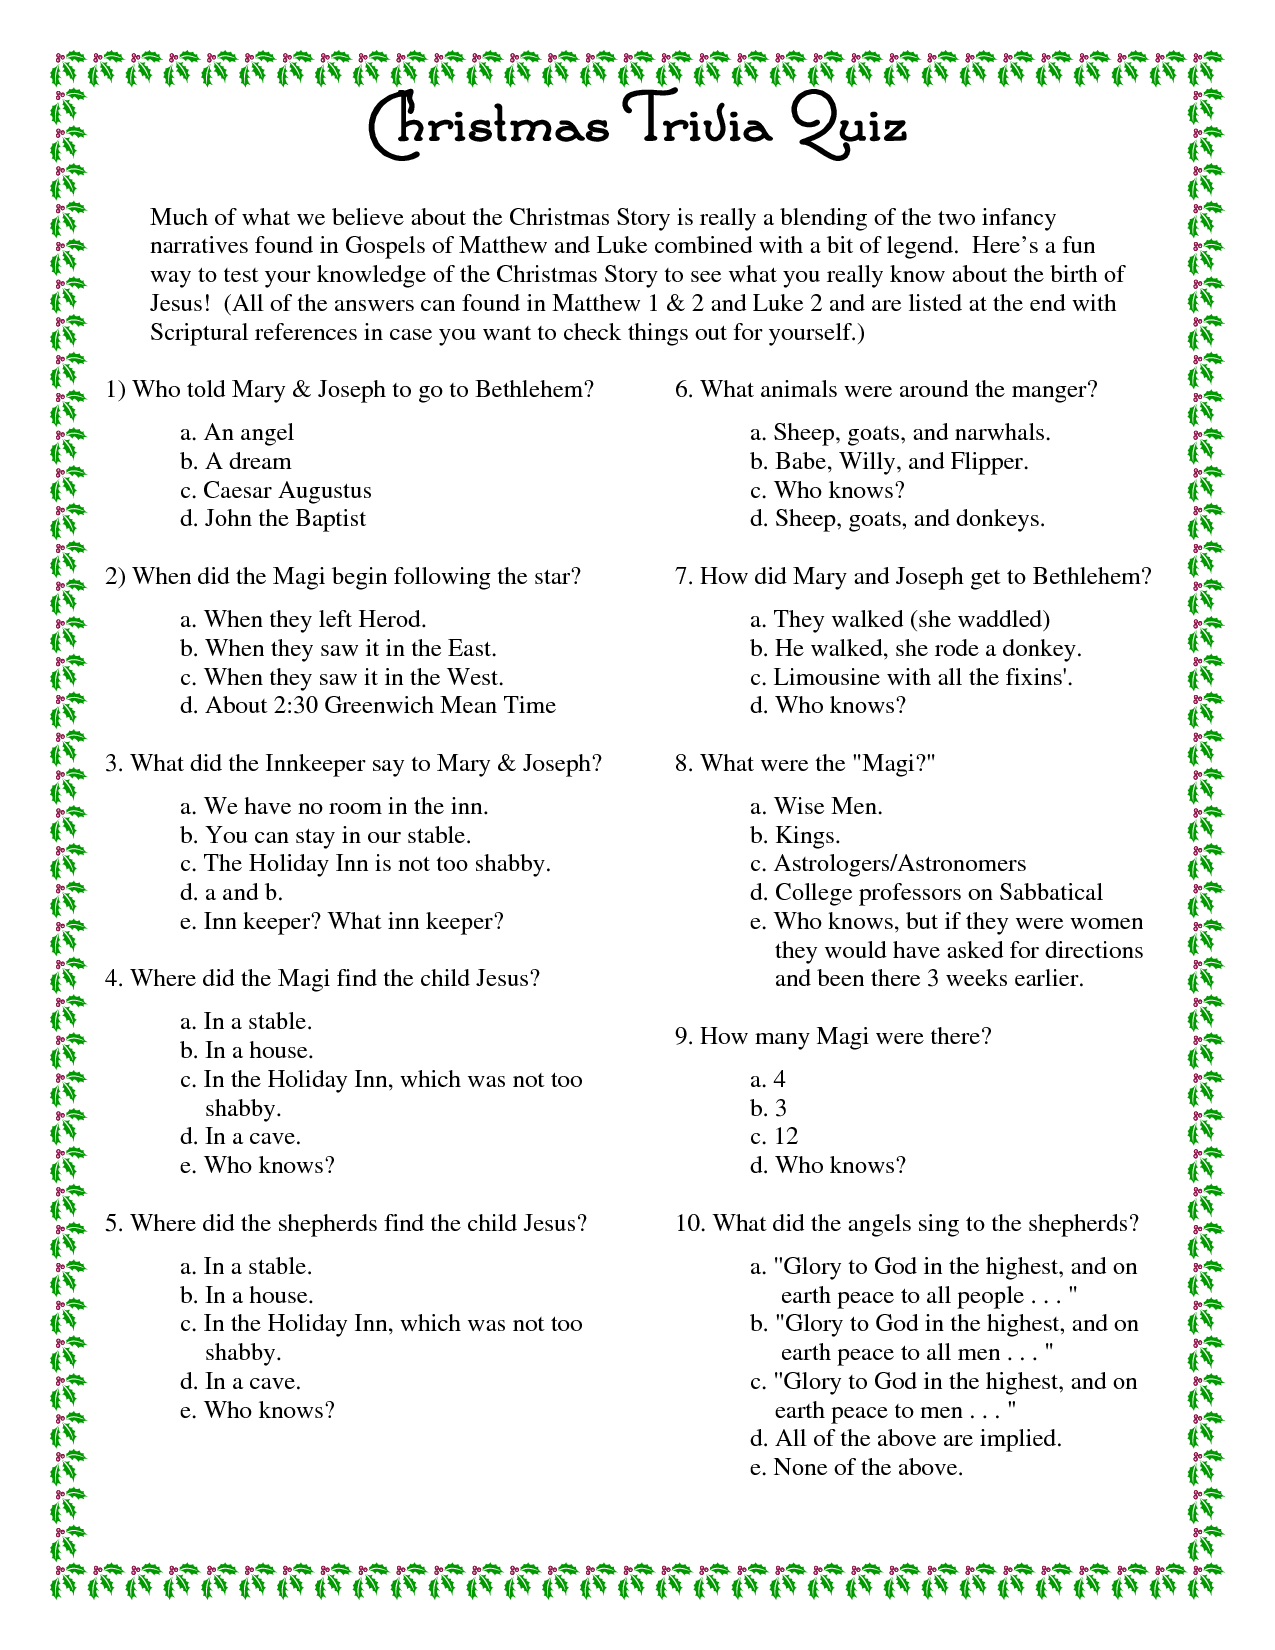 Printable+Christmas+Trivia+Questions+And+Answers | Christmas - Free Christmas Picture Quiz Questions And Answers Printable